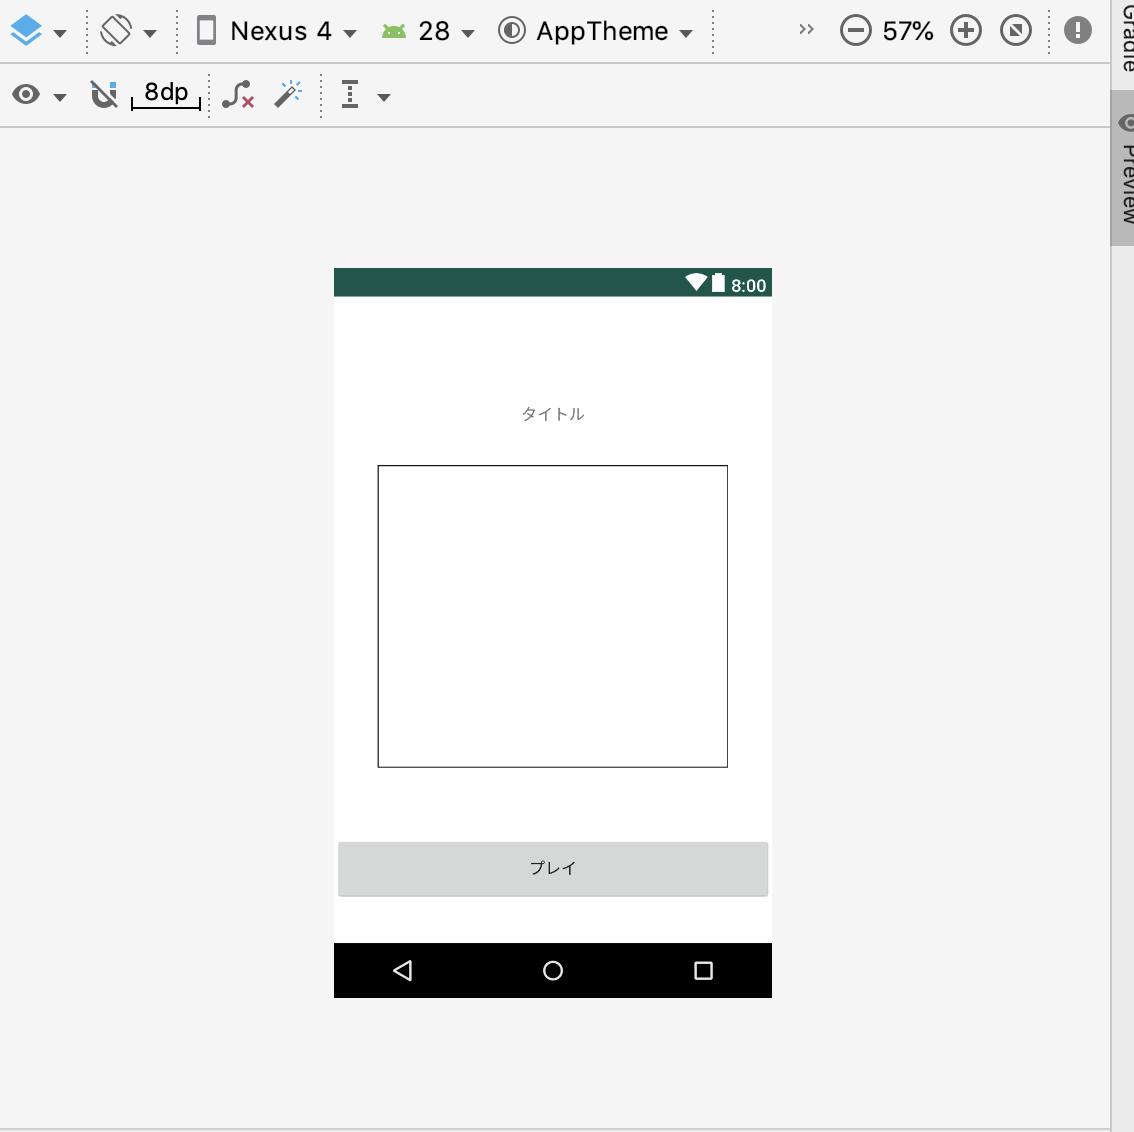 AndroidでUIを組むならLinearLayoutのweightSumを使うと早いかも